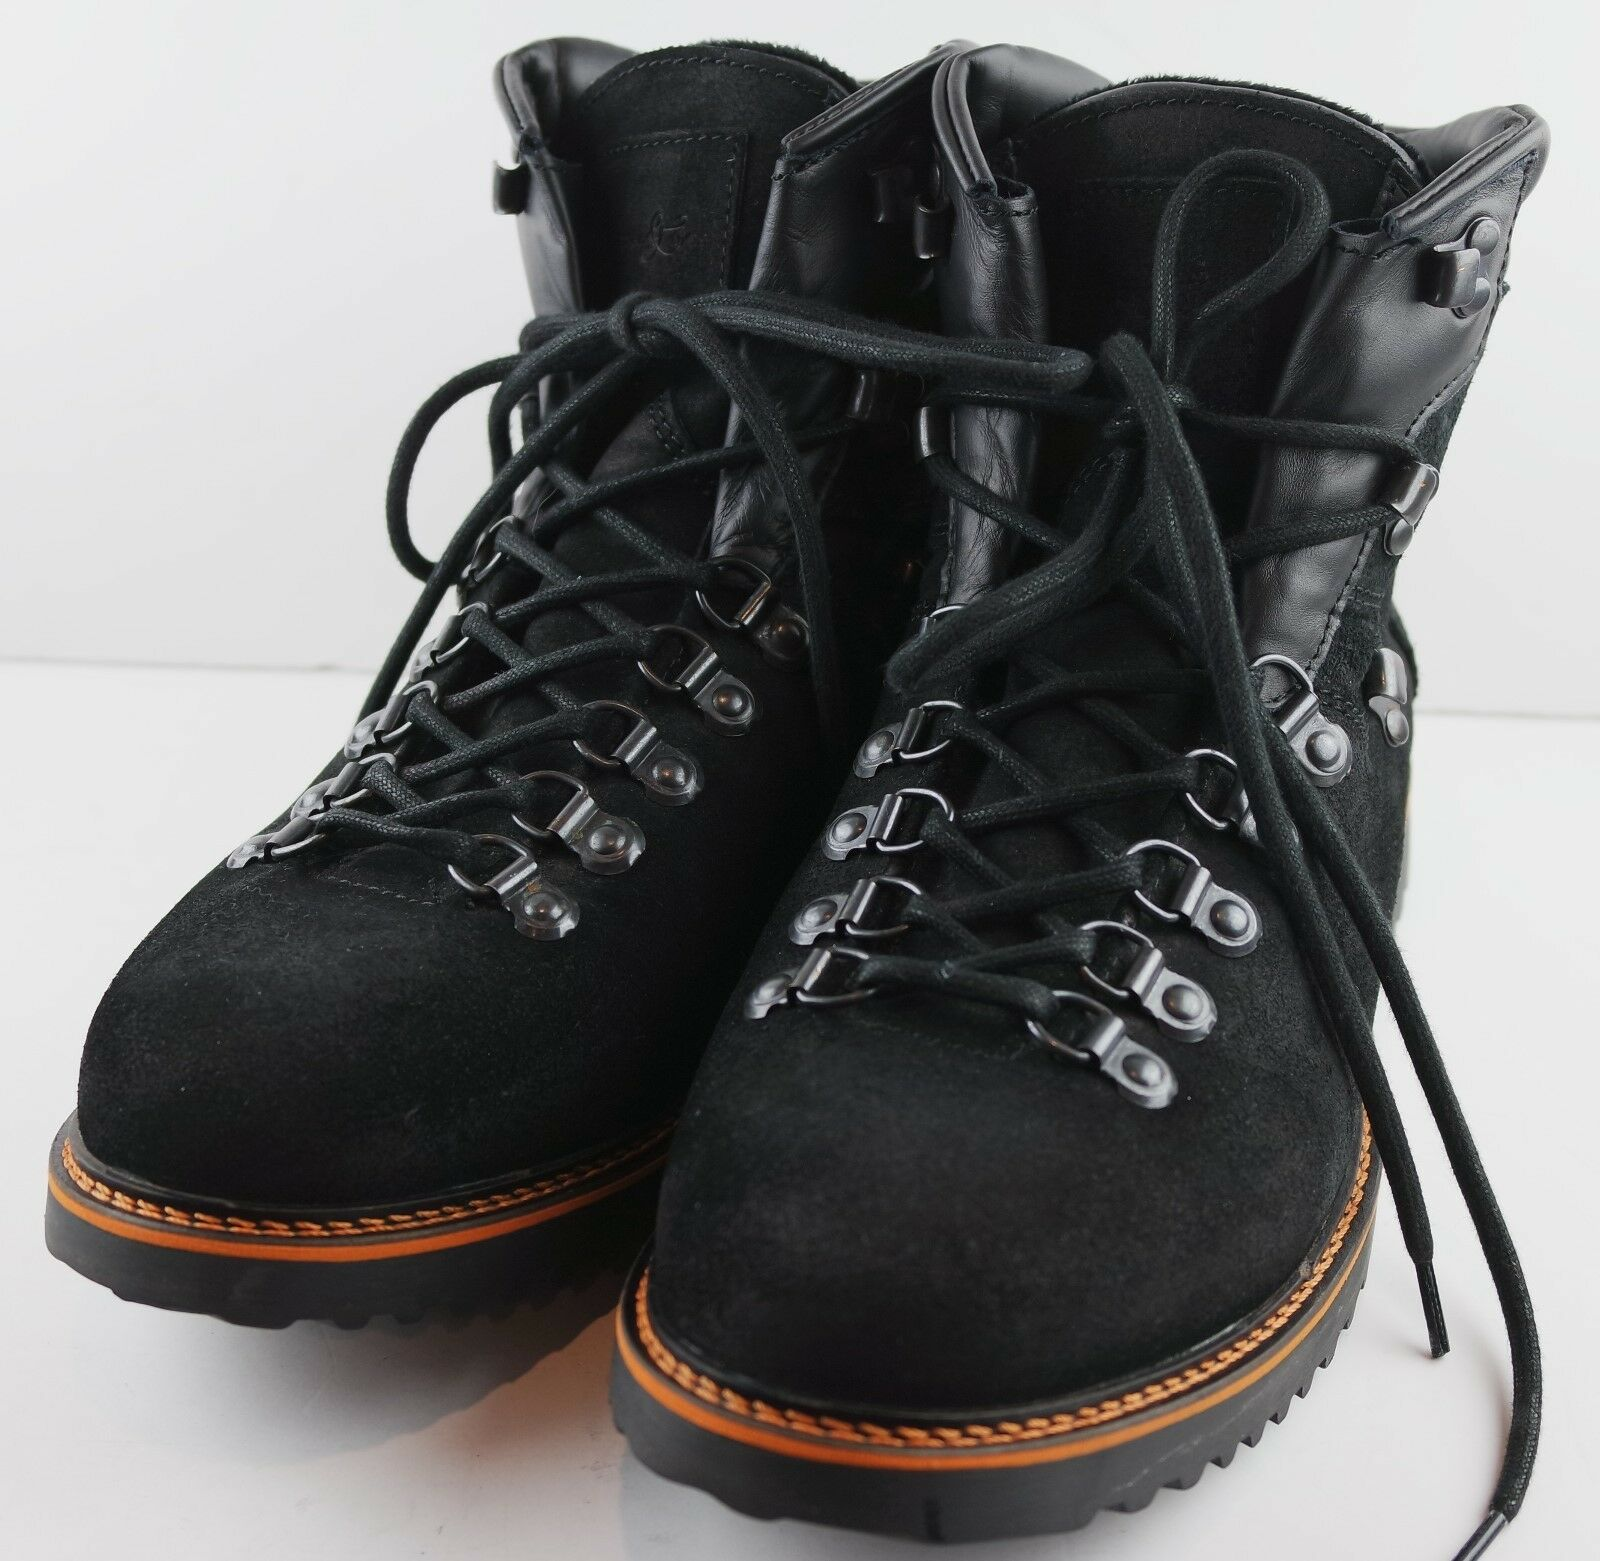 Timmons Impermeable botas De Gamuza Negra para hombre MSRP  talla nos 10